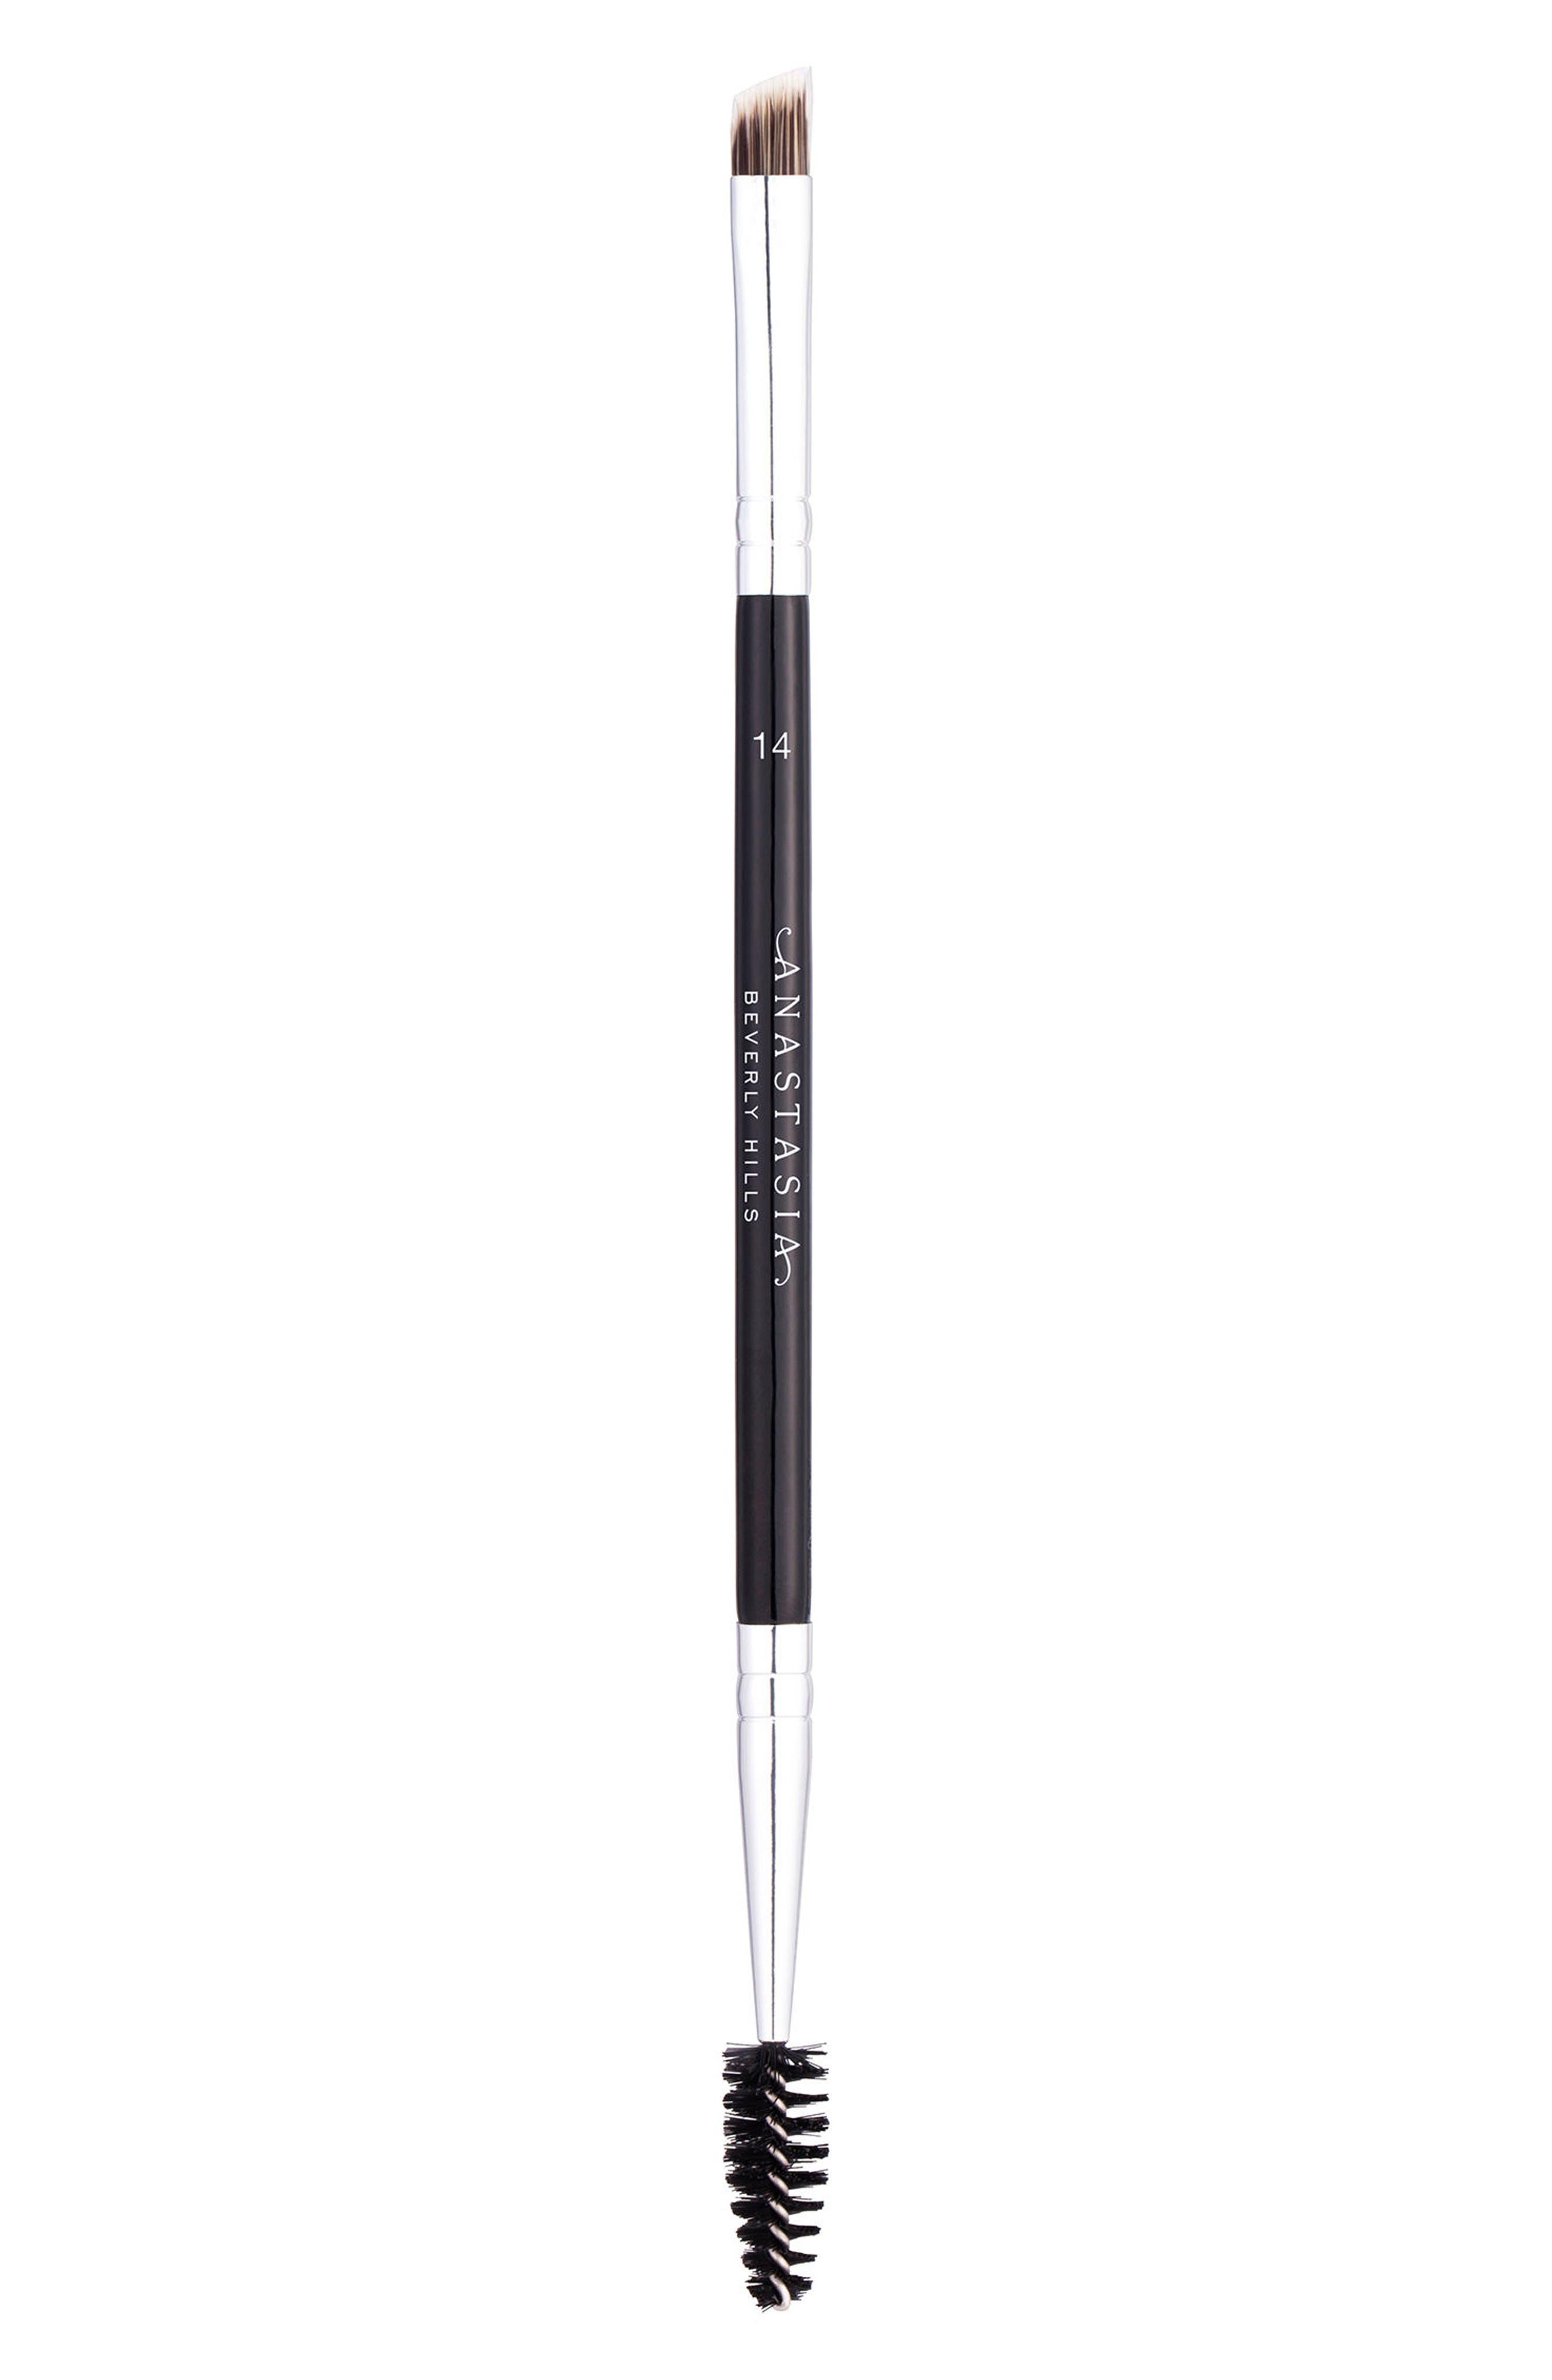 Anastasia Beverly Hills #14 Dual-Sided Brow & Eyeliner Brush